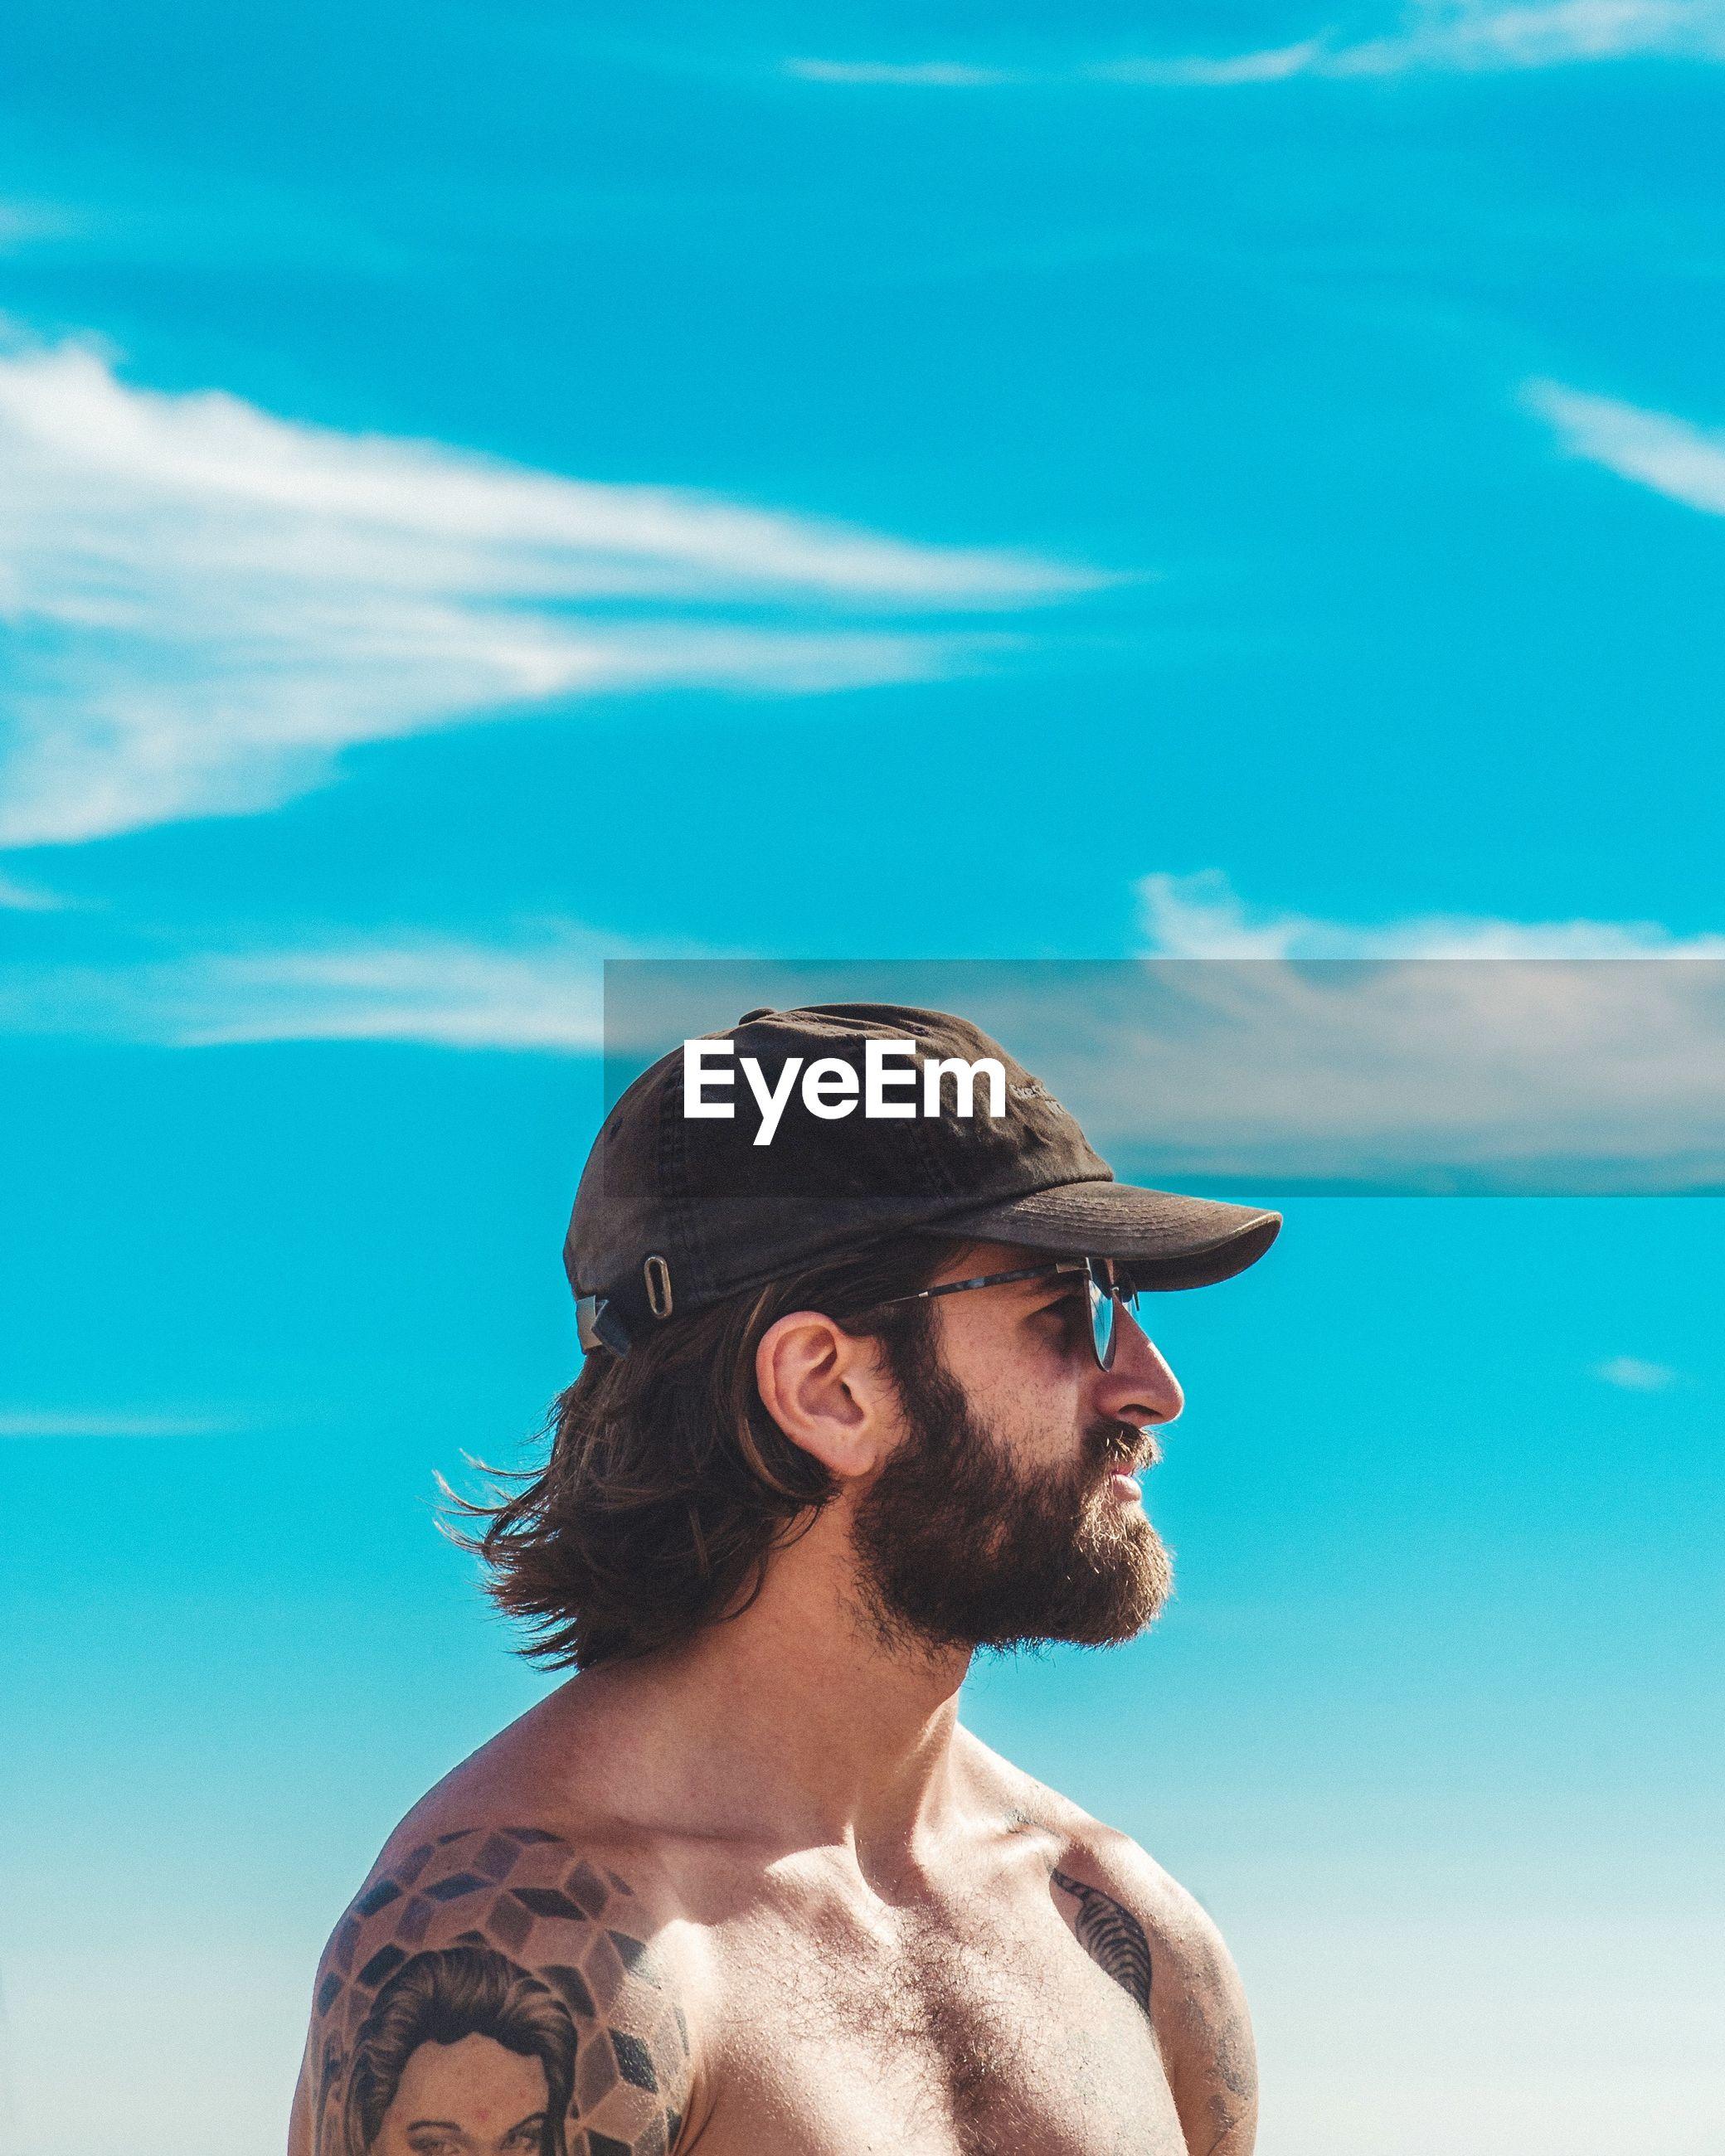 Shirtless man wearing cap against blue sky